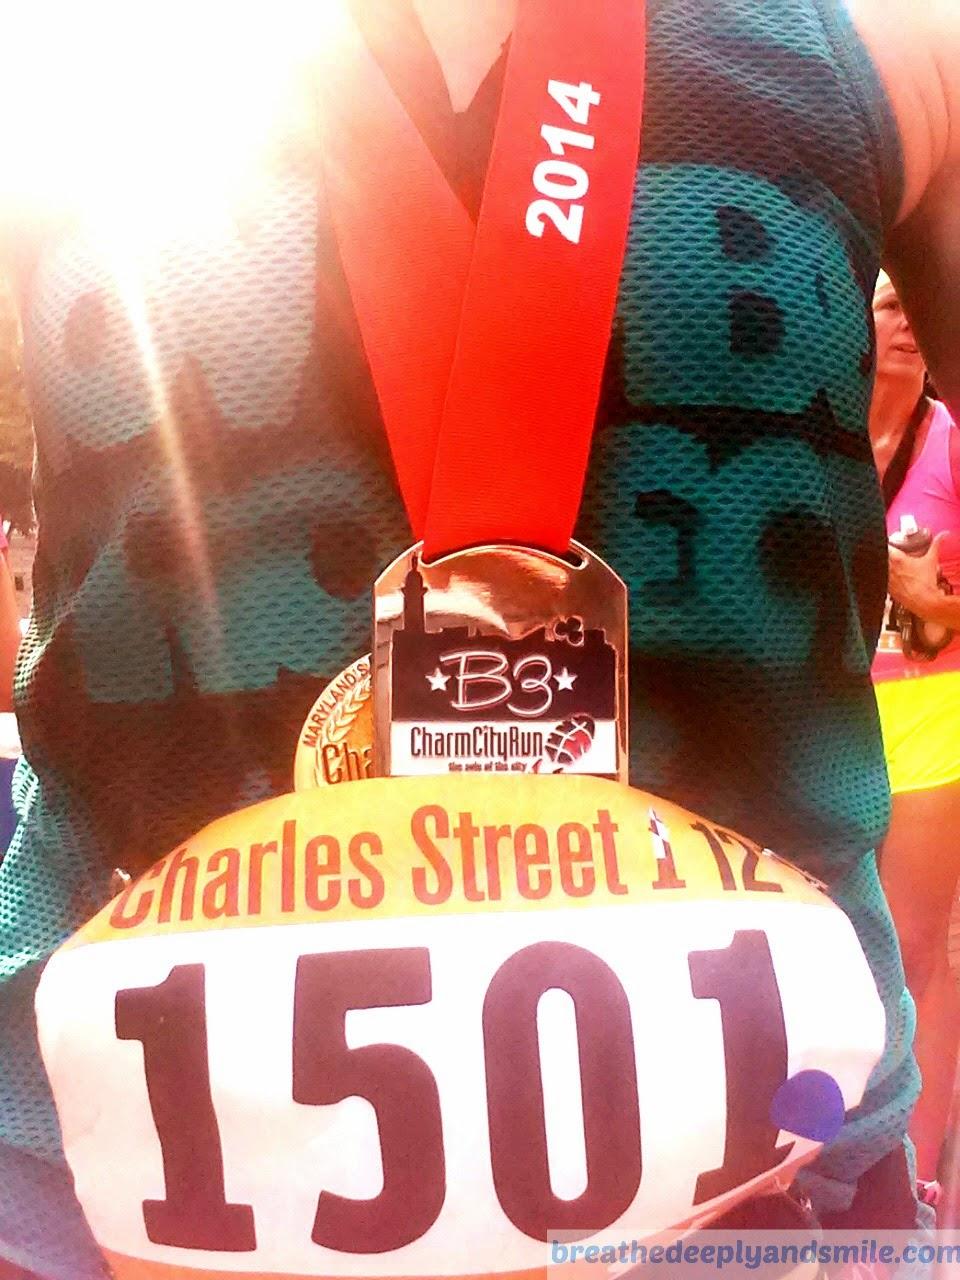 CharlesStreet12racemedals